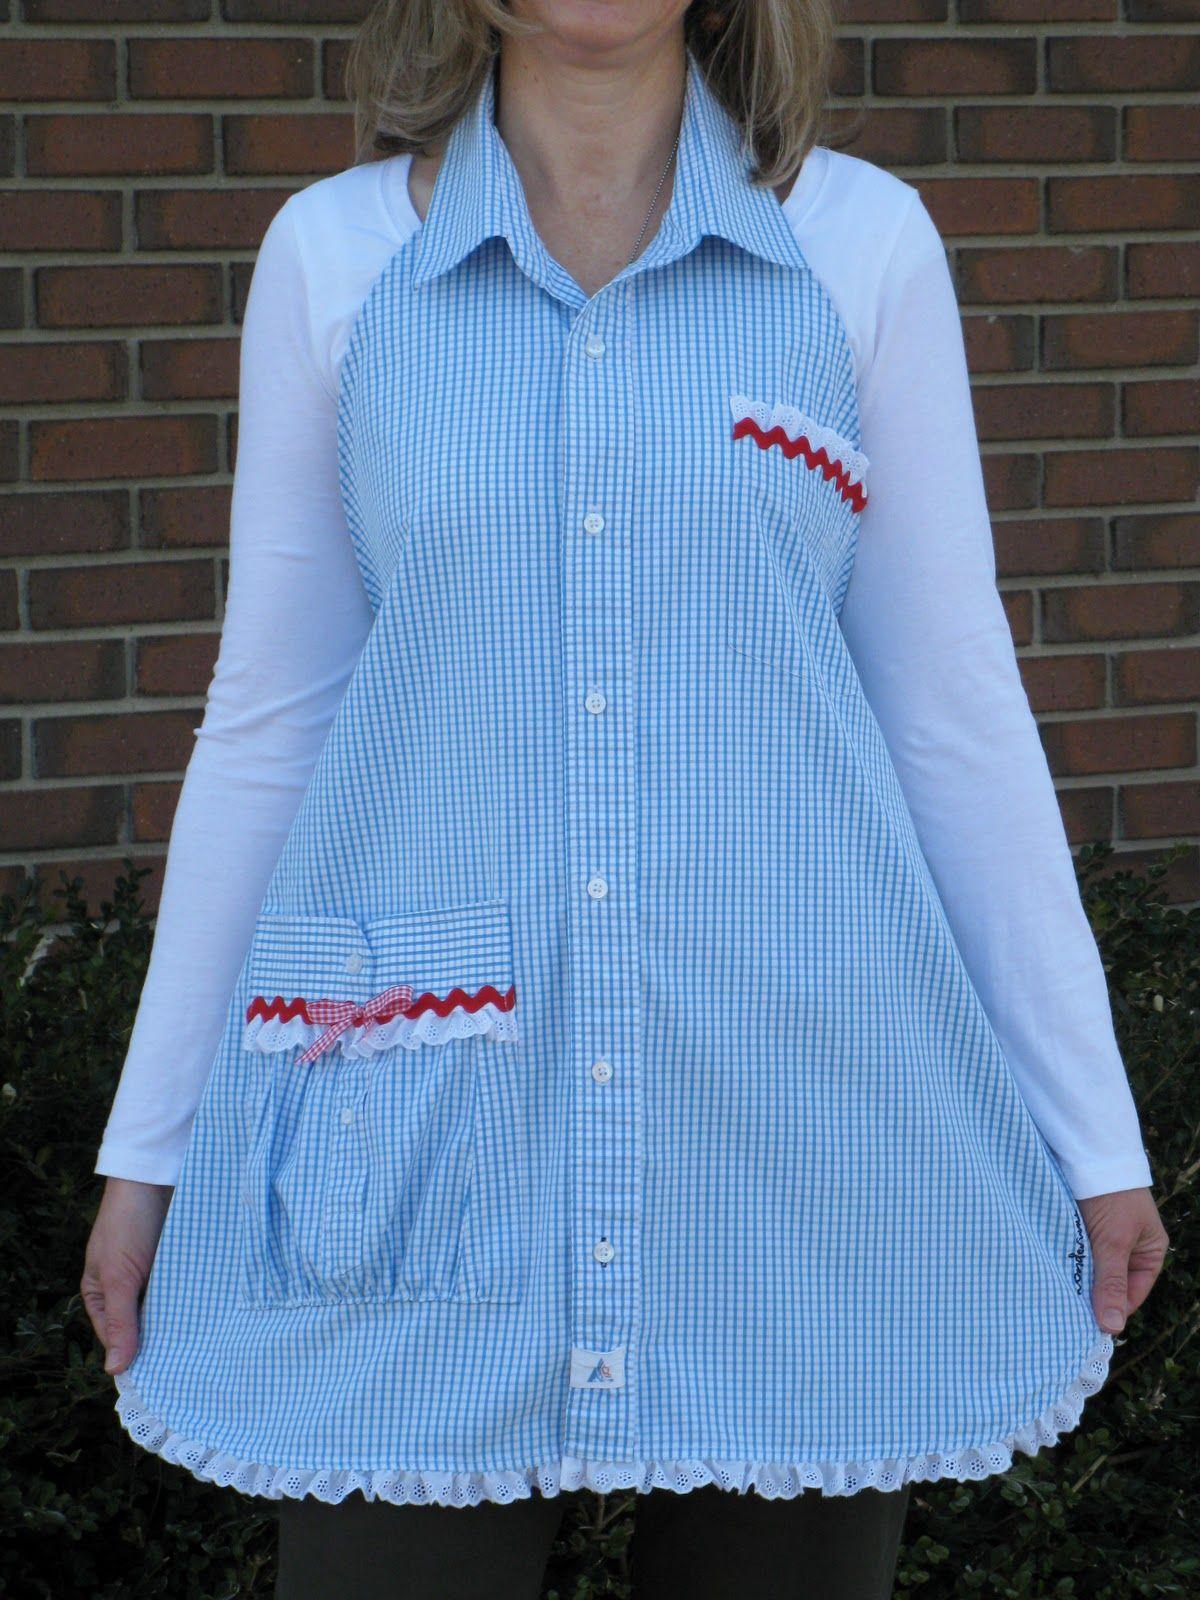 Flannel shirt apron  Mens Shirt Apron Easy DIY Video Instructions Cute Ideas  Apron